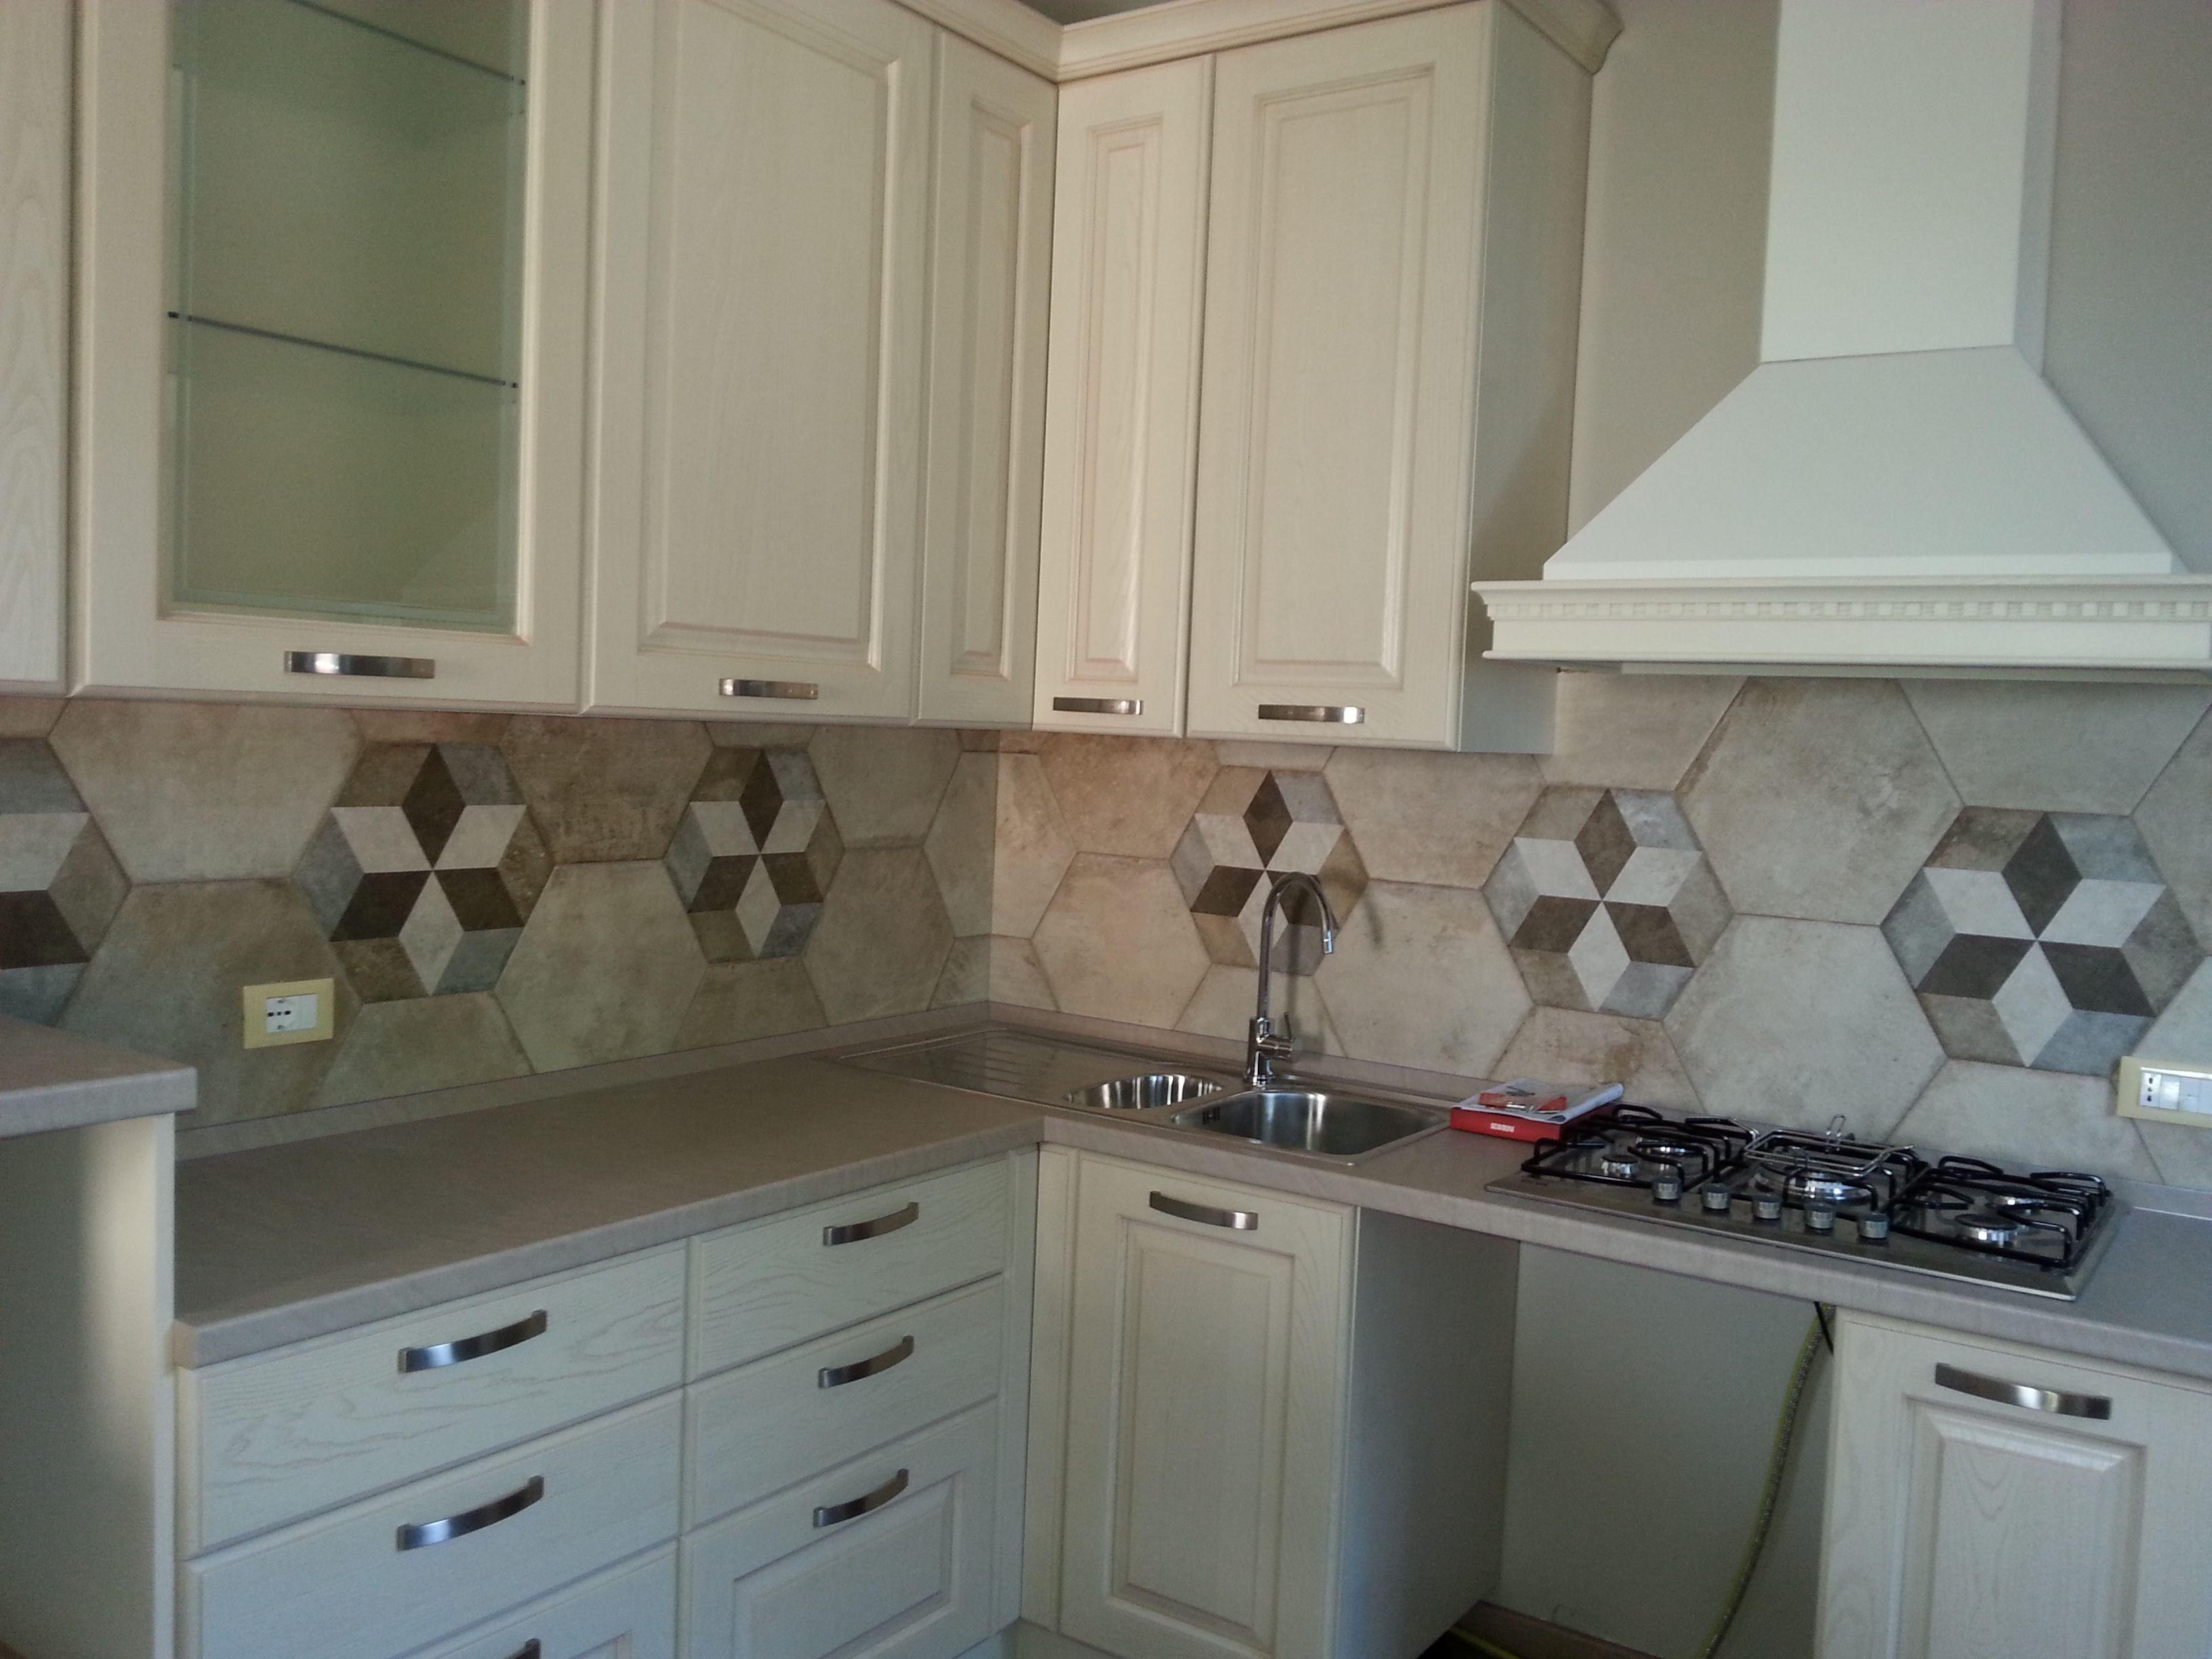 ceramicafioranese #Heritage rivestimento cucina con piastrelle ...